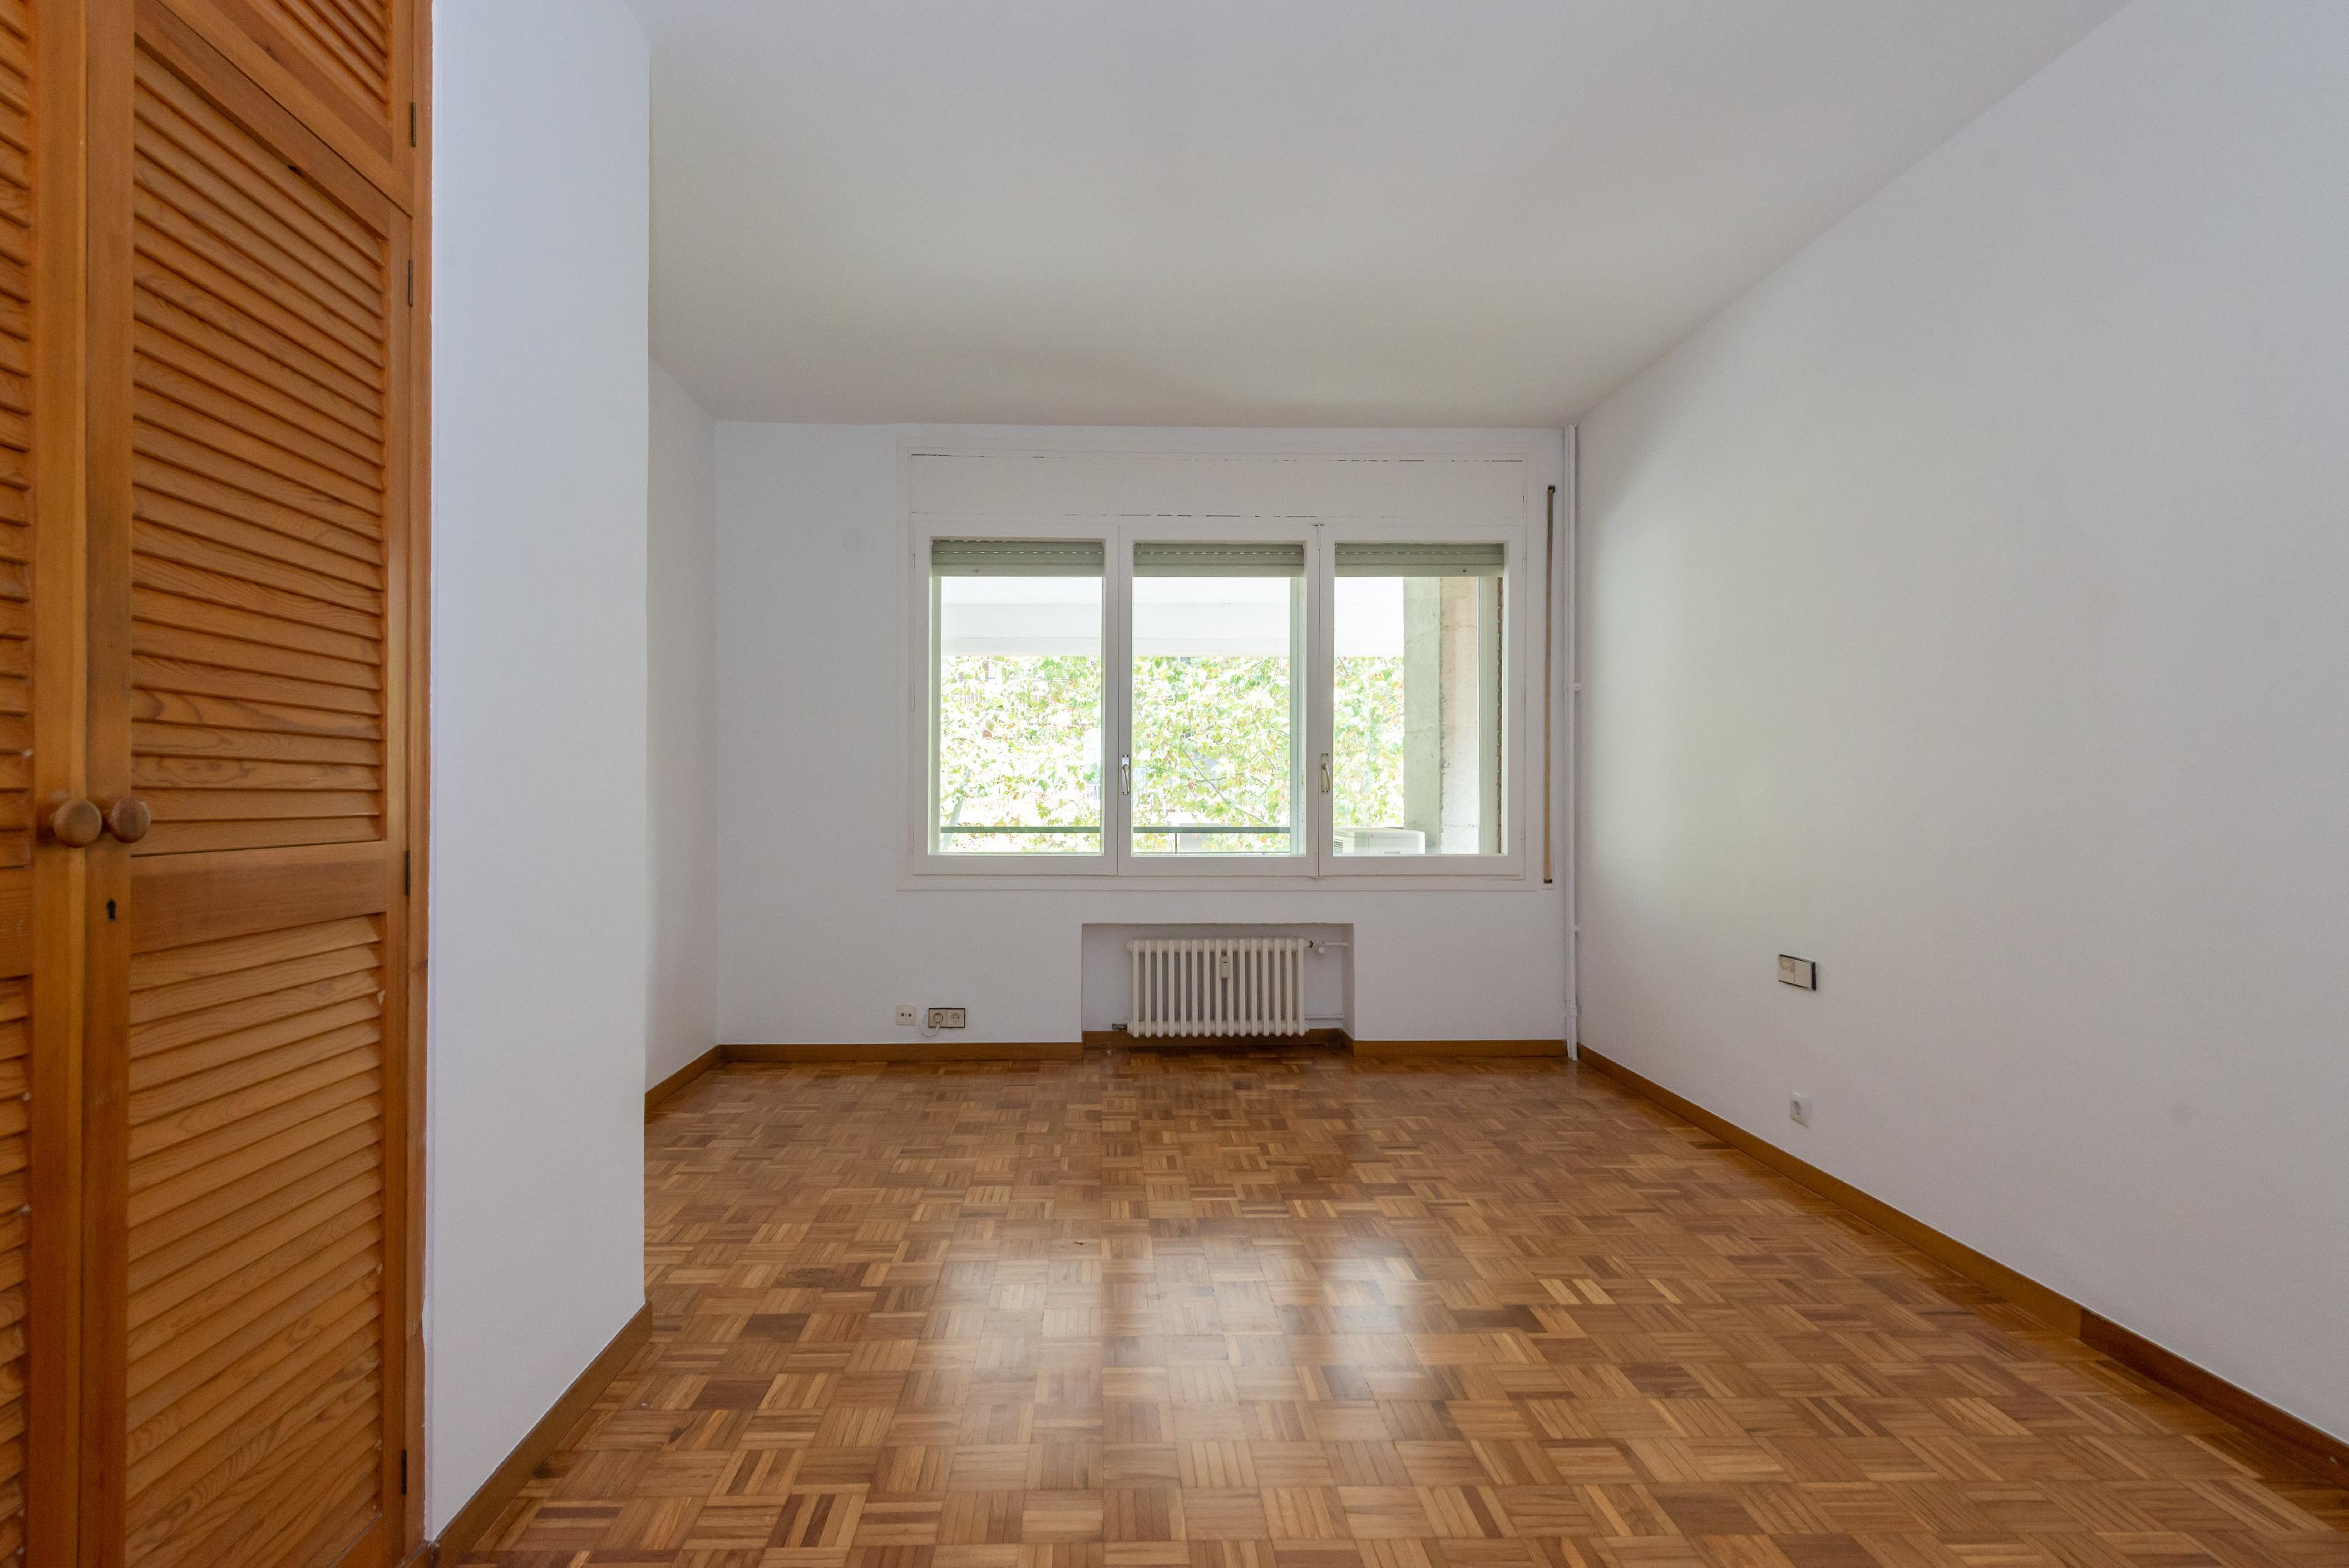 253470 Flat for sale in Sarrià-Sant Gervasi, El Putxet and Farró 18